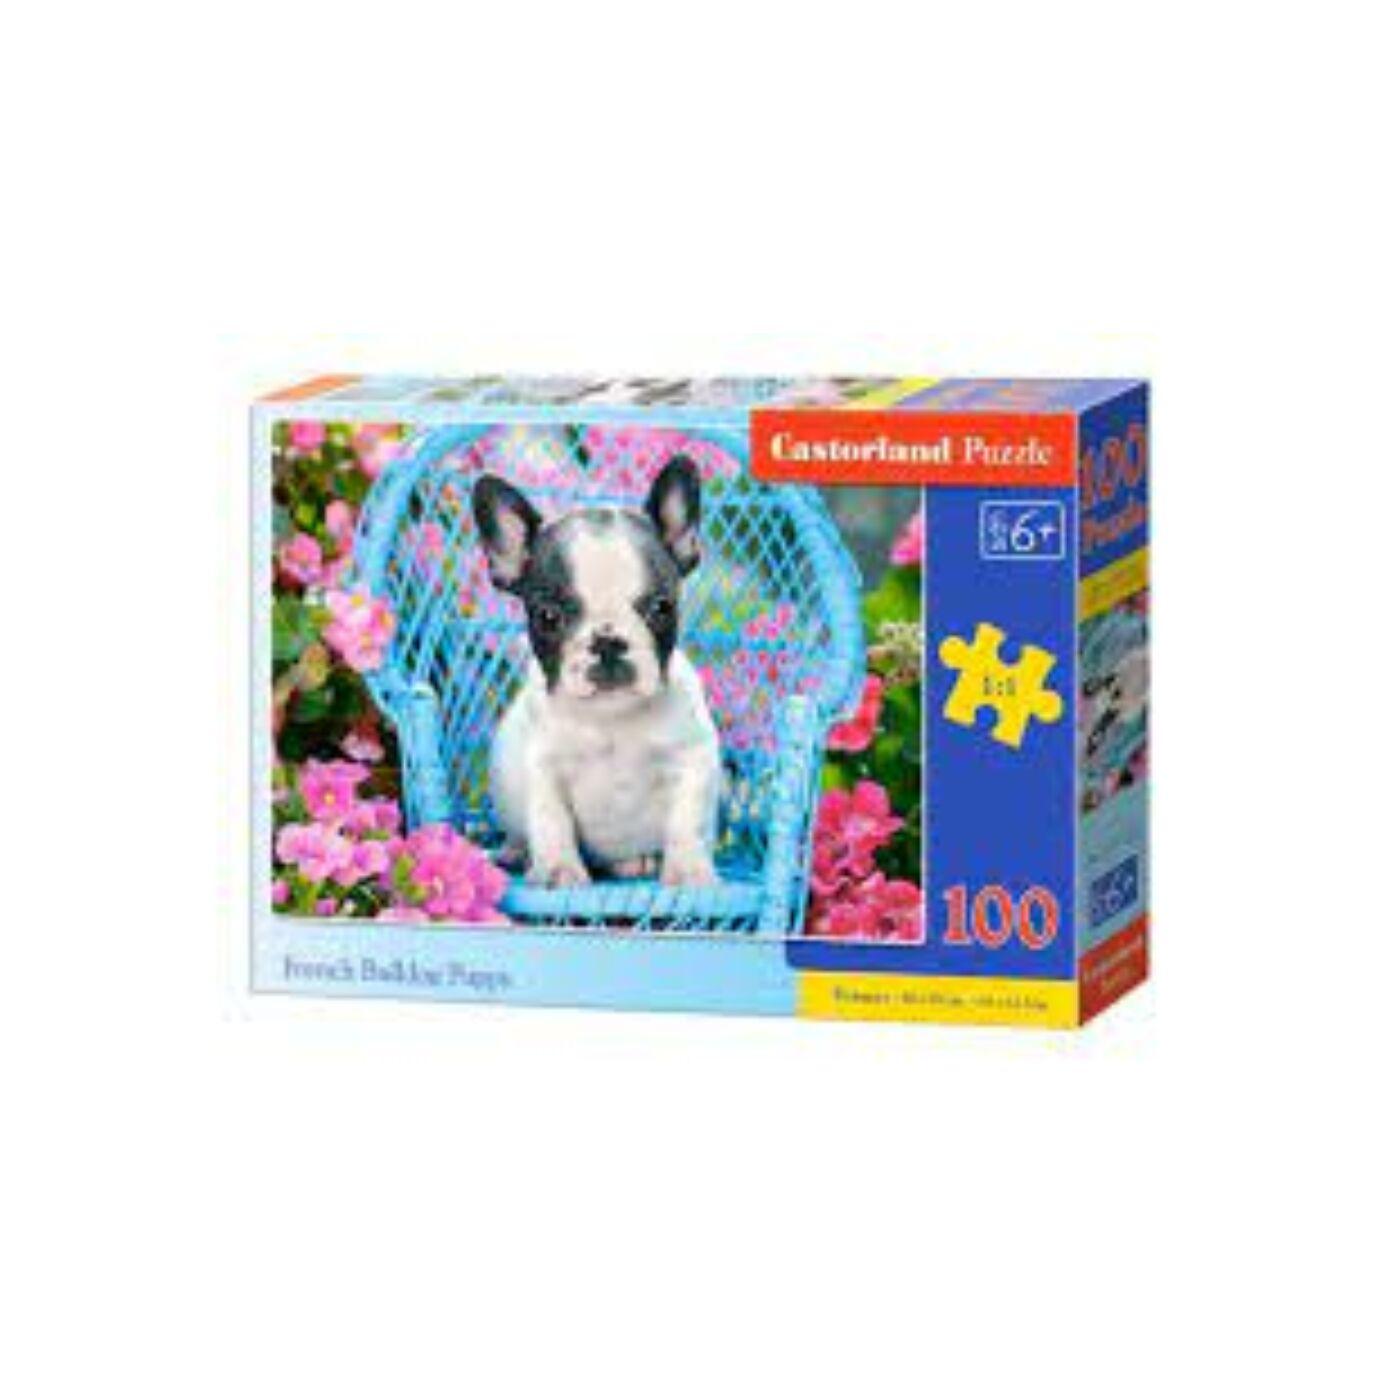 100 db-os Castorland puzzle - Francia bulldog kölyök